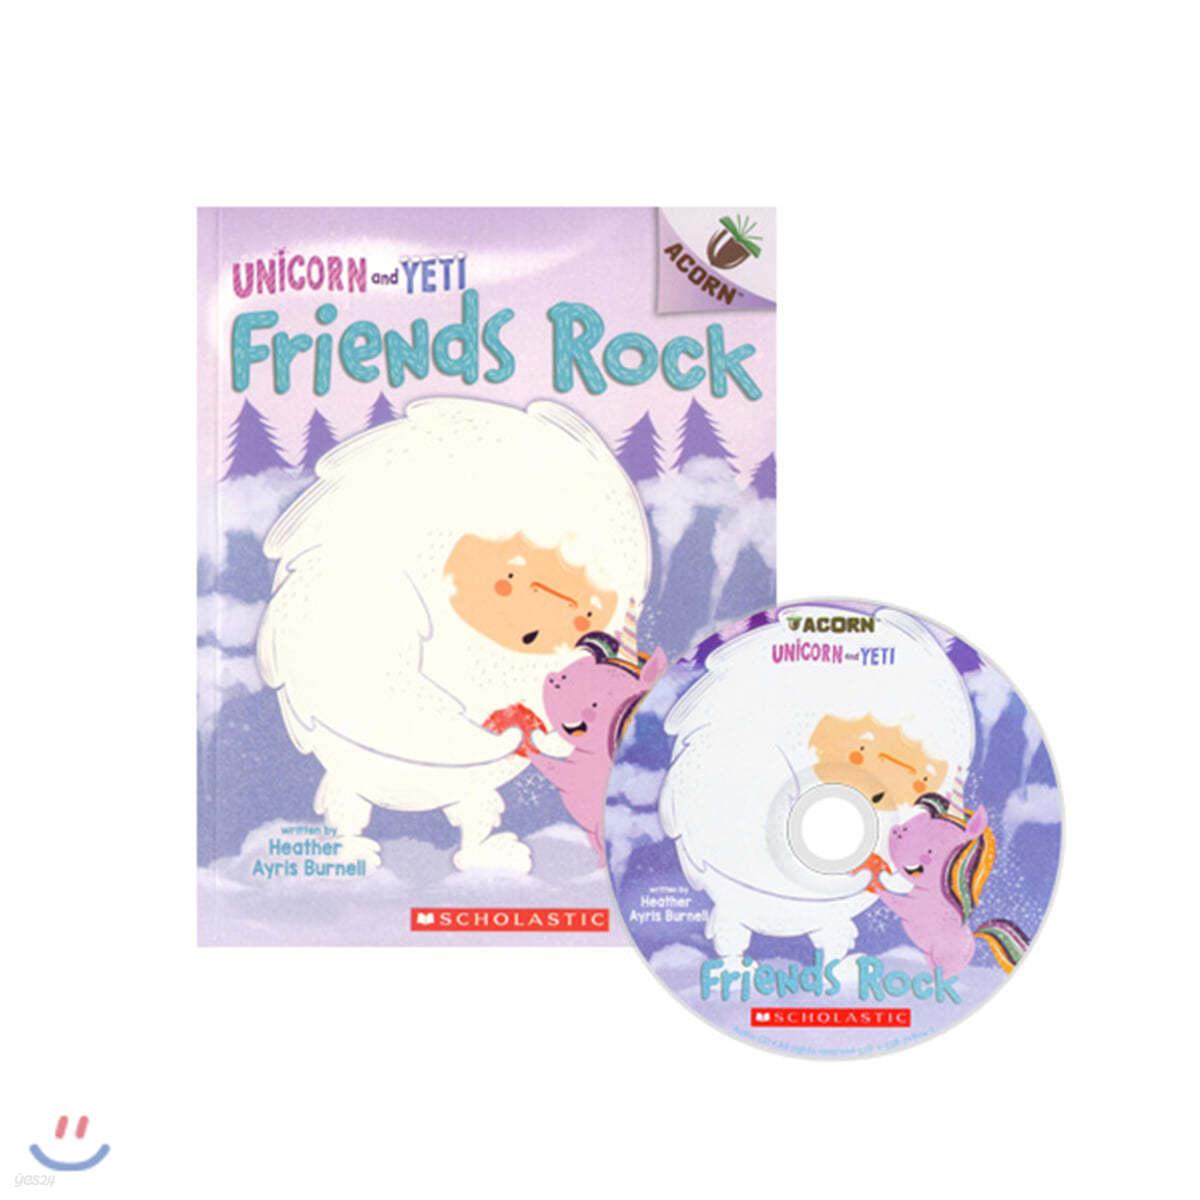 Unicorn And Yeti #3: Friends Rock (CD & StoryPlus)